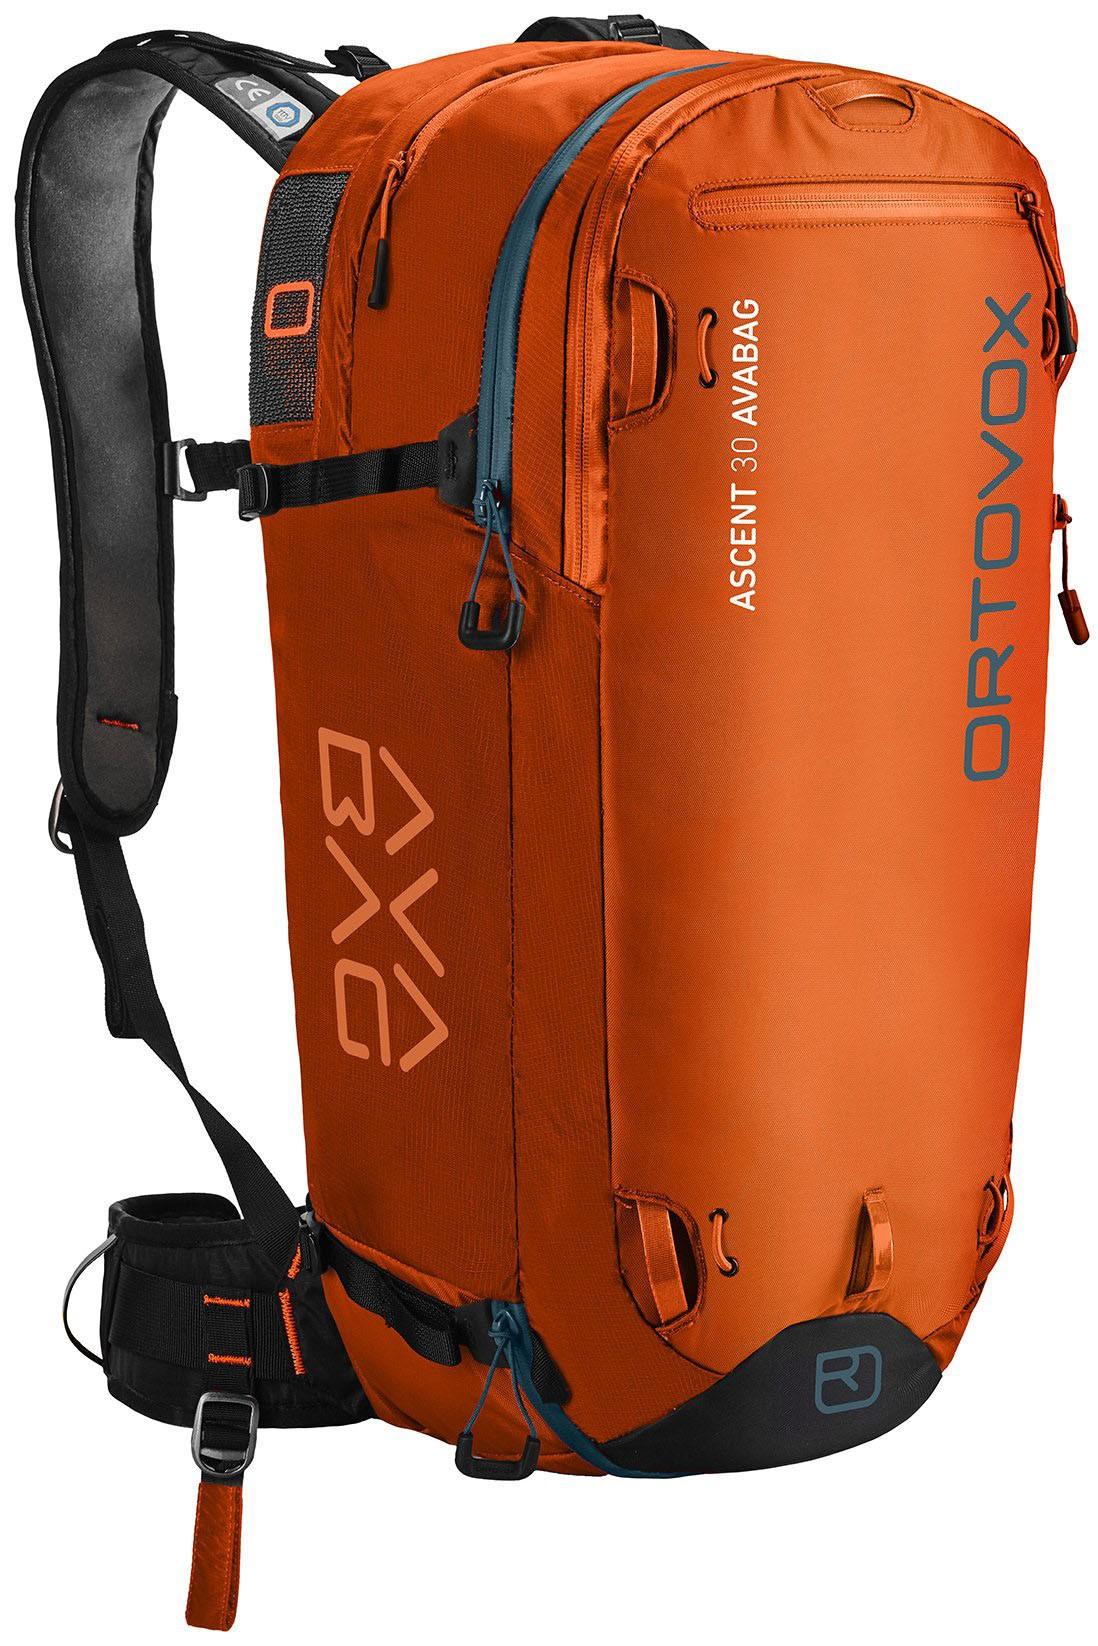 72349e930f Ortovox Ascent 30 Avabag Kit crazy orange 18 19 Barva  oranžová